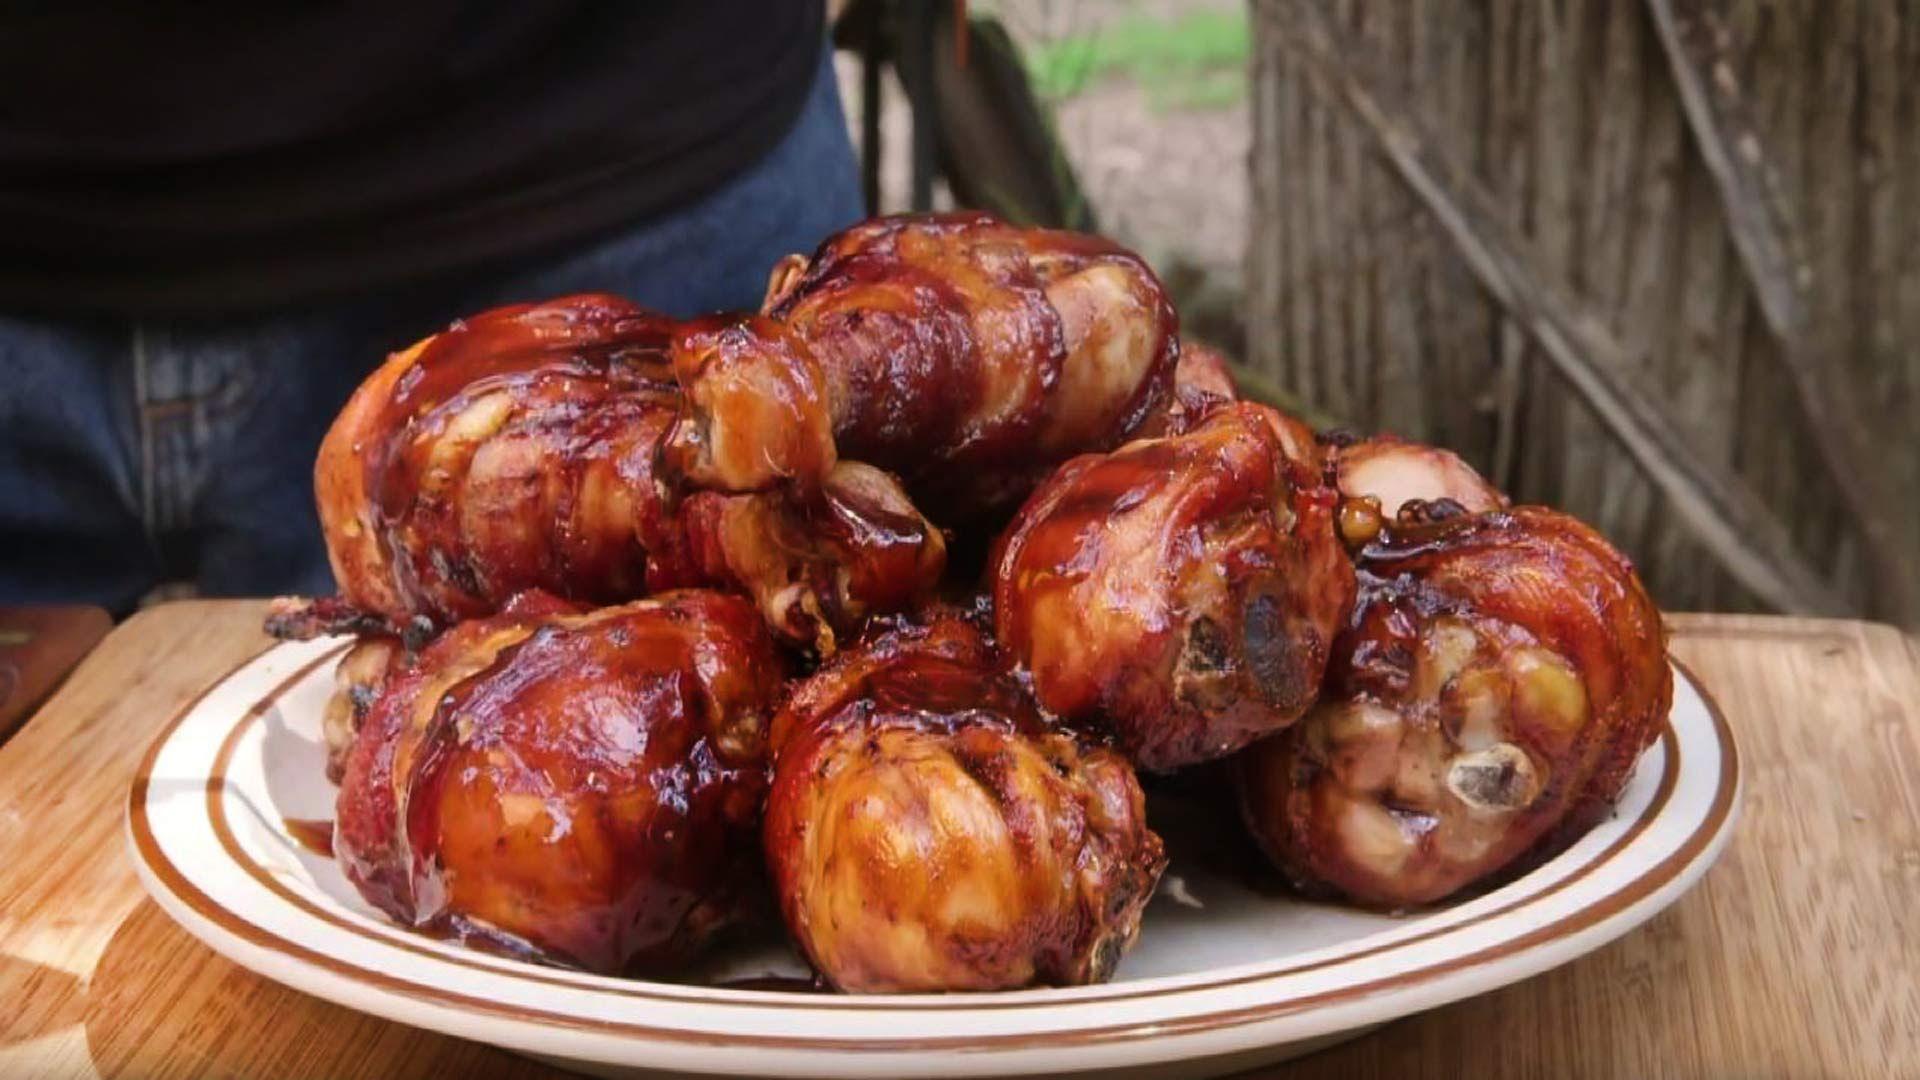 Chicken Pot Legs Chicken Pot Legs - New Hampshire - The BBQ Pit Boys